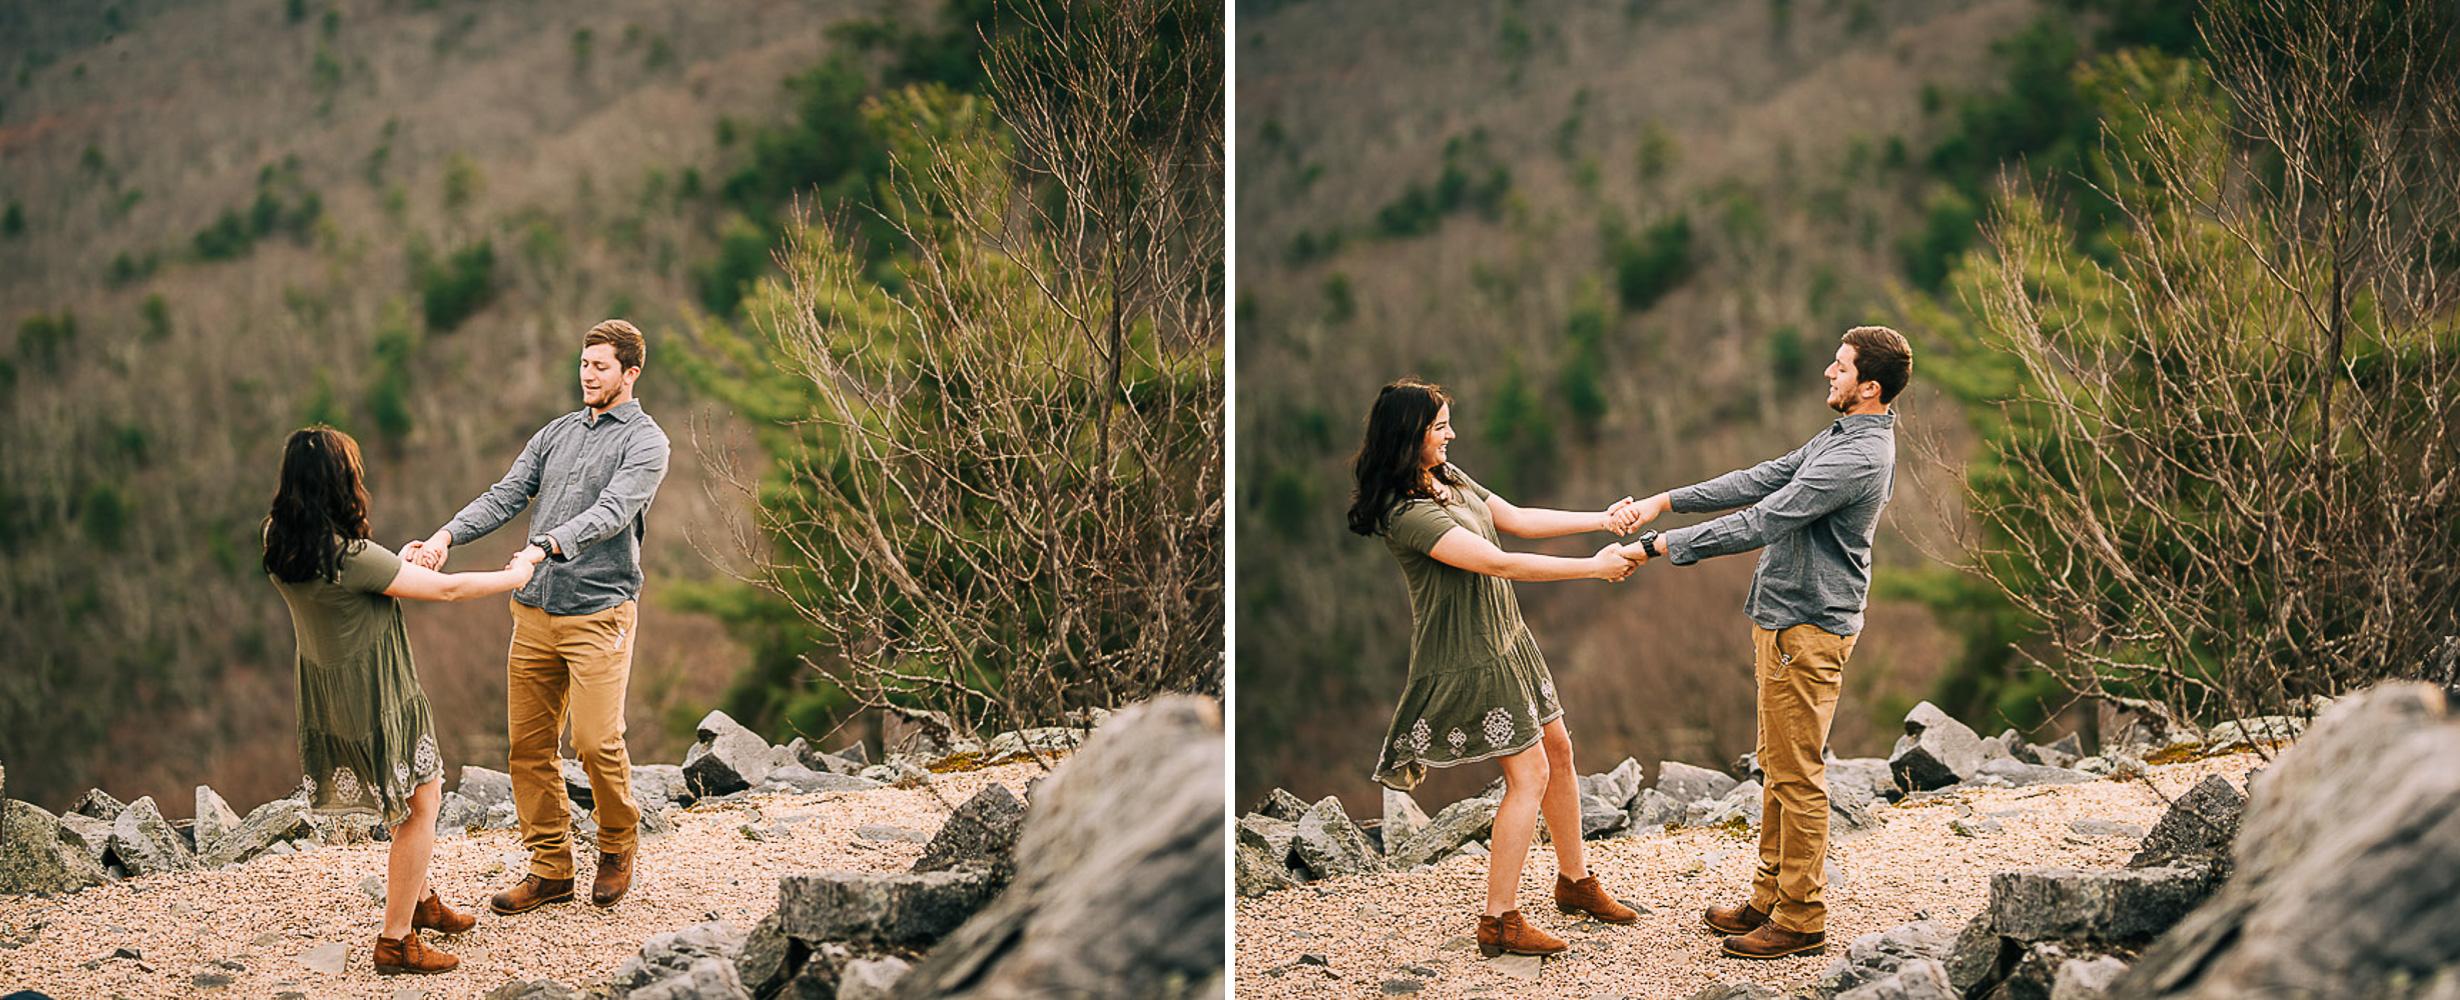 Sunrise Portriats, Mountain Portraits, Engagement Portraits, Anniversary Portraits, Summer Mast Photography 11.jpg